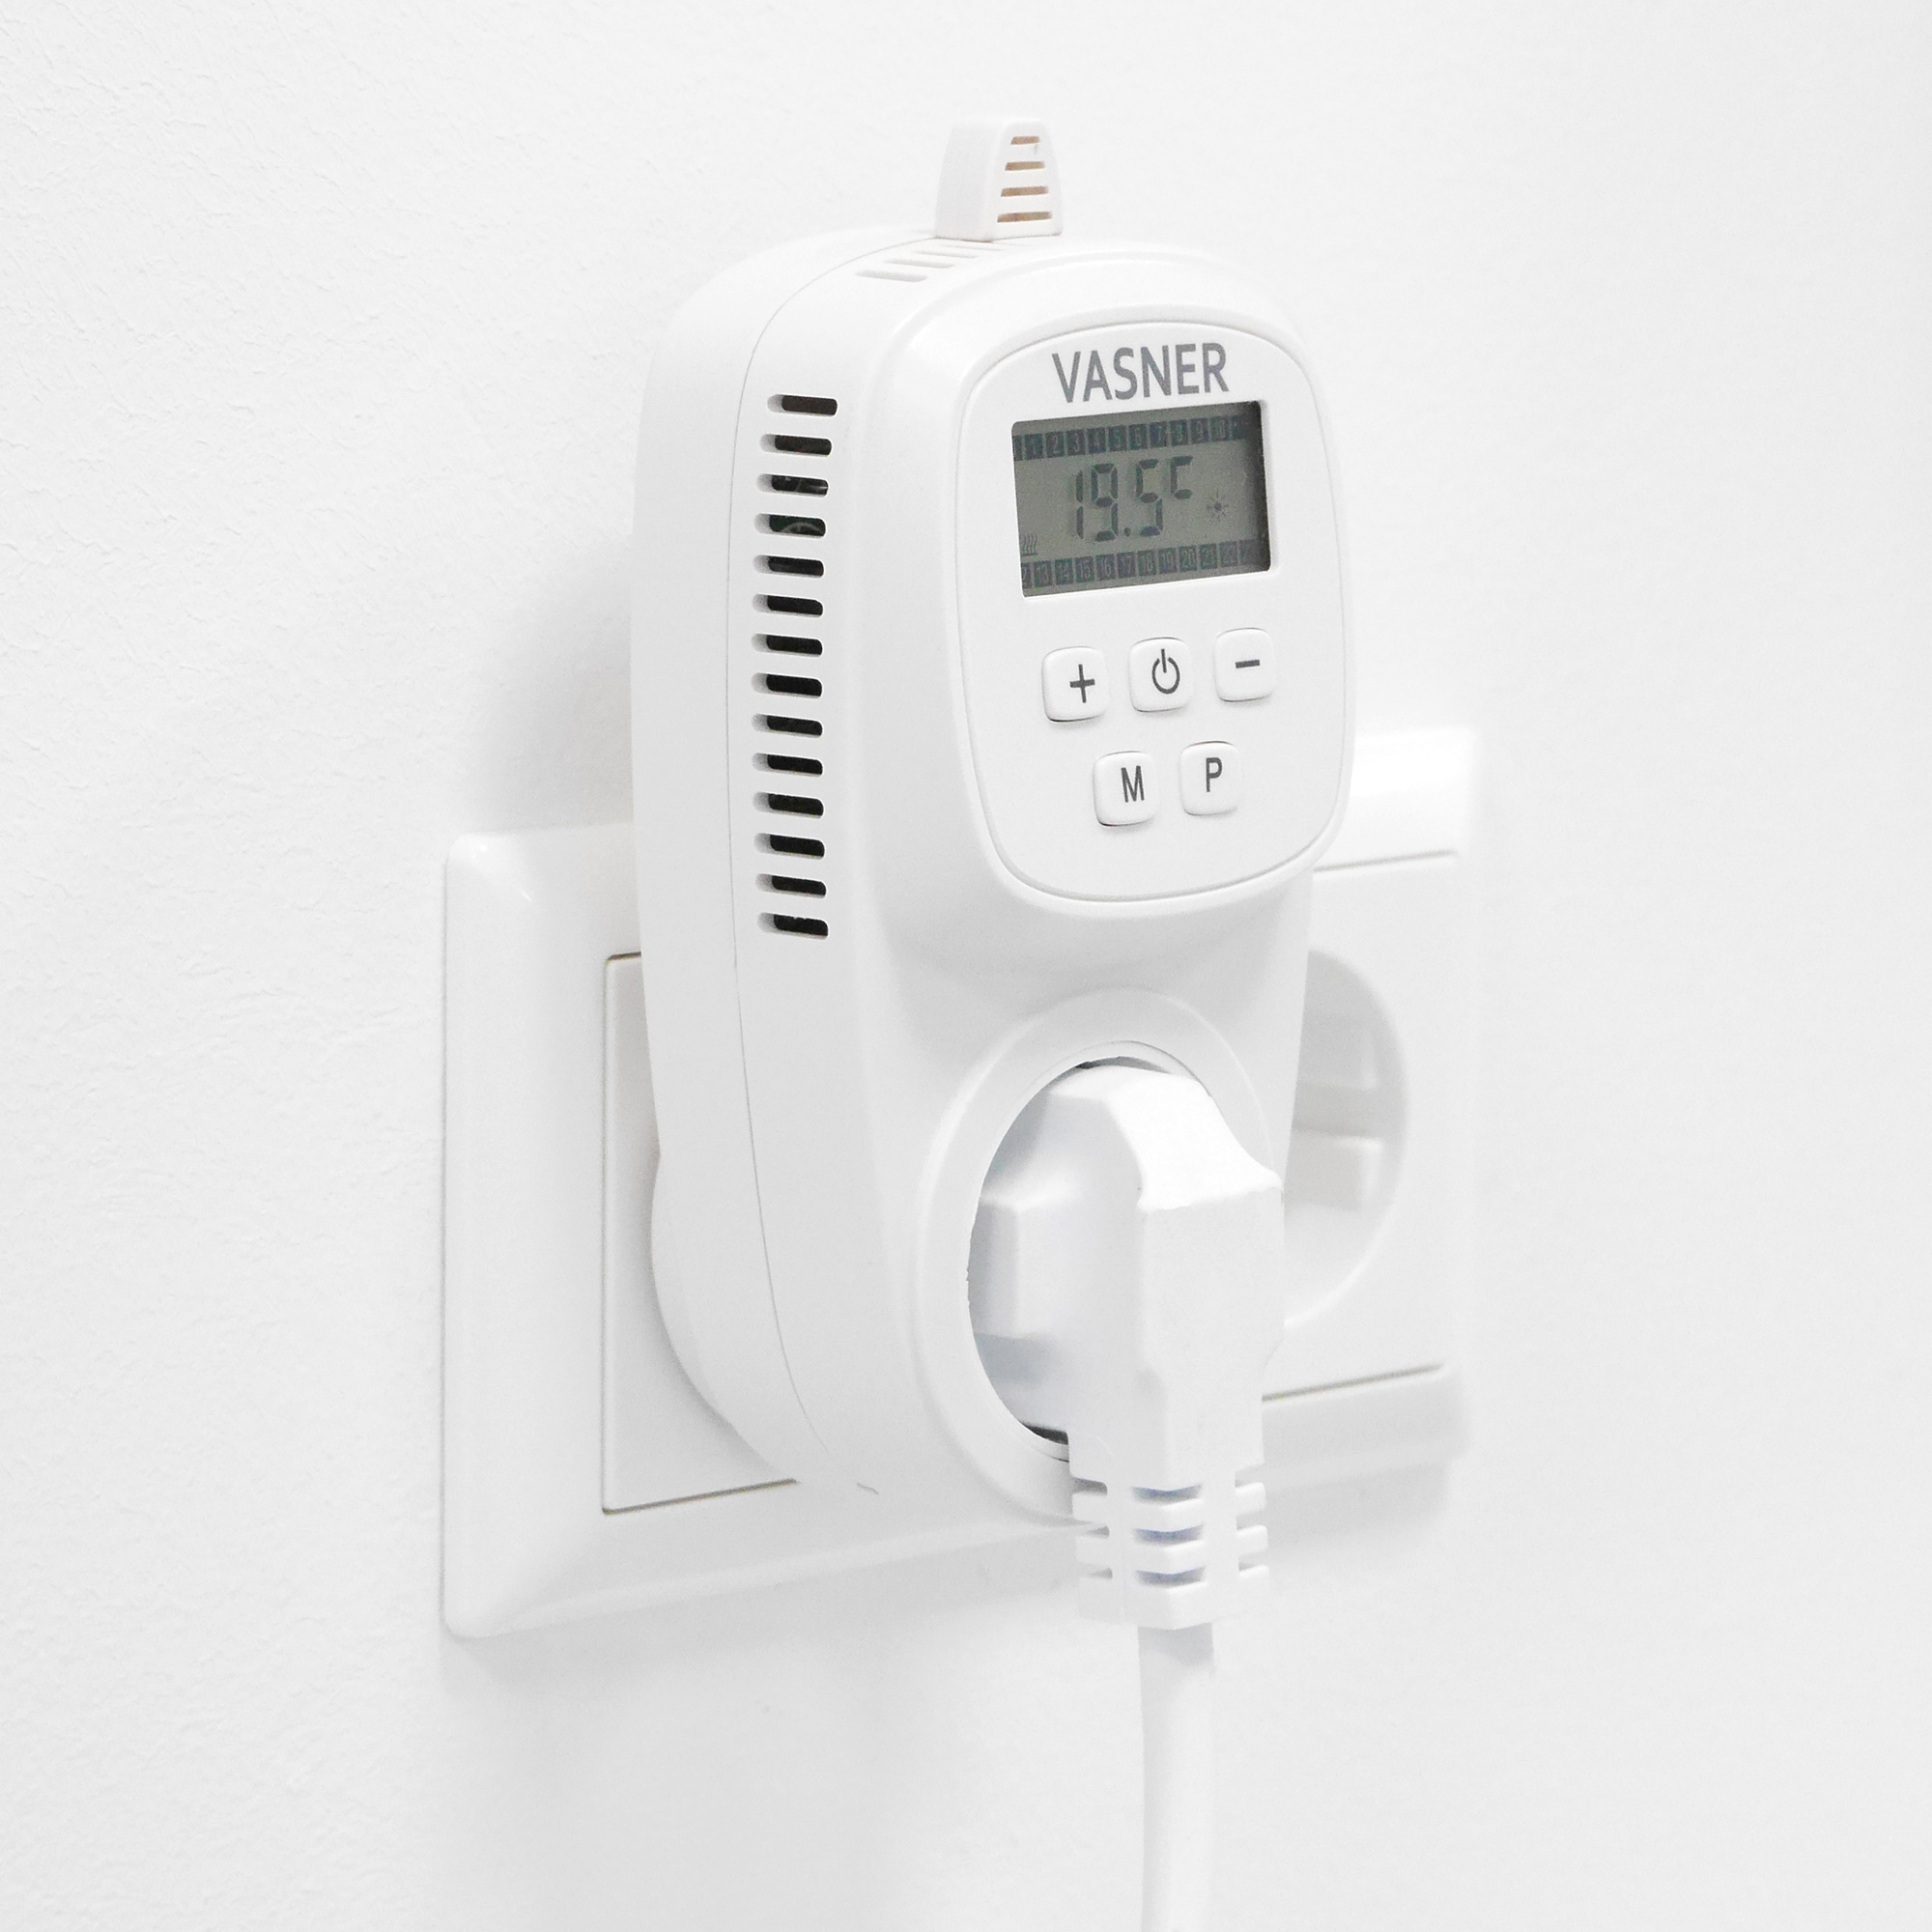 tips-efficient-thermostat-programming-ideal-room-temperature